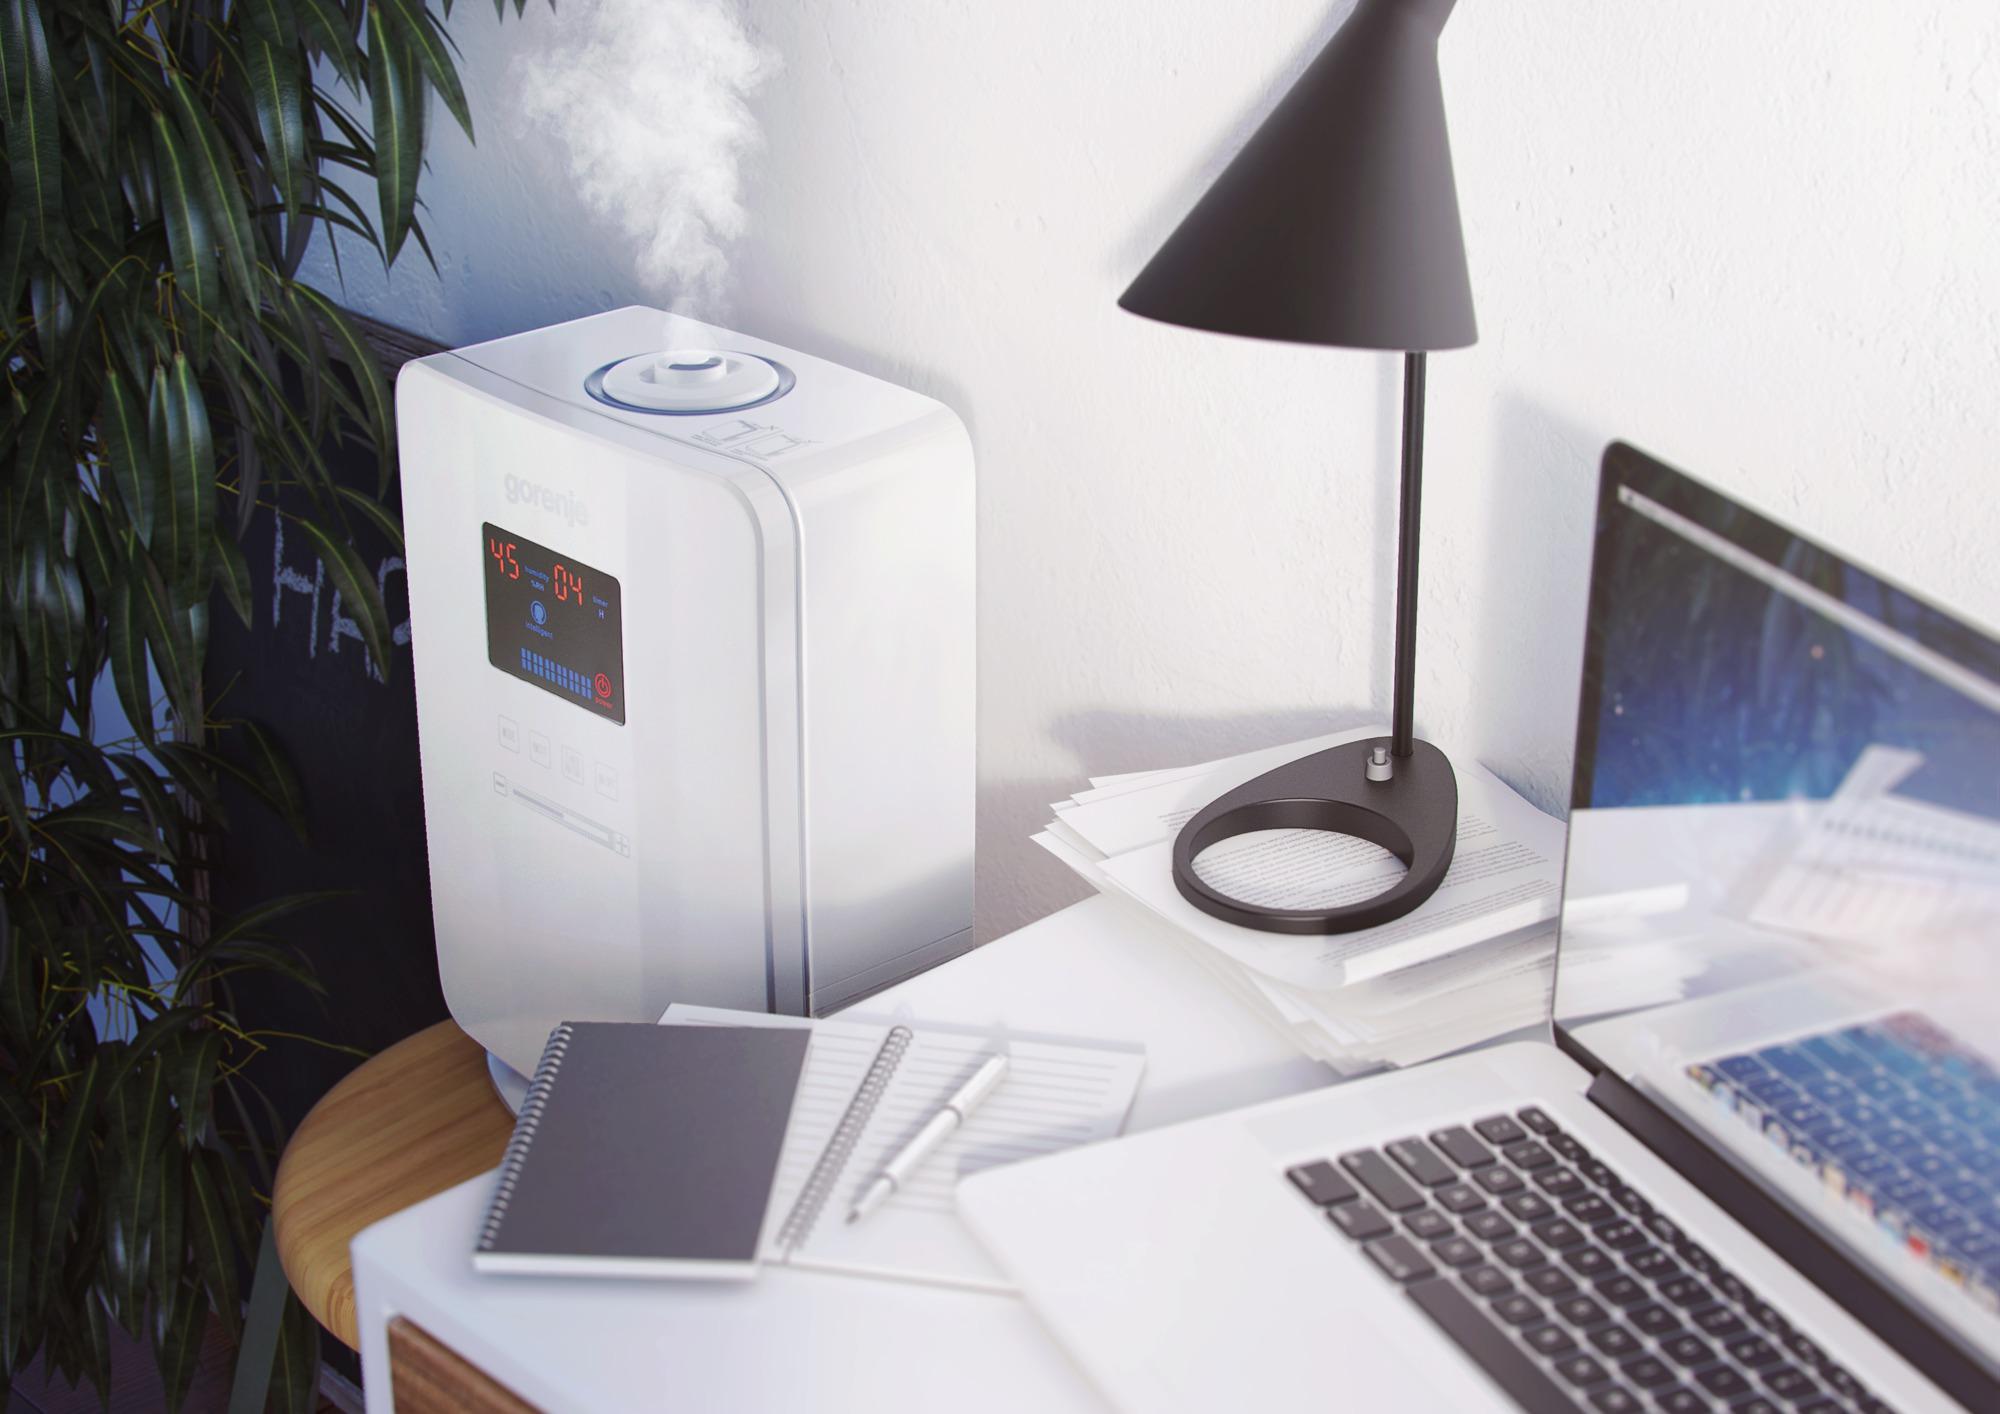 GORENJE 108775_file_print_SDA15_Ambient_Air_humidifier_landscape